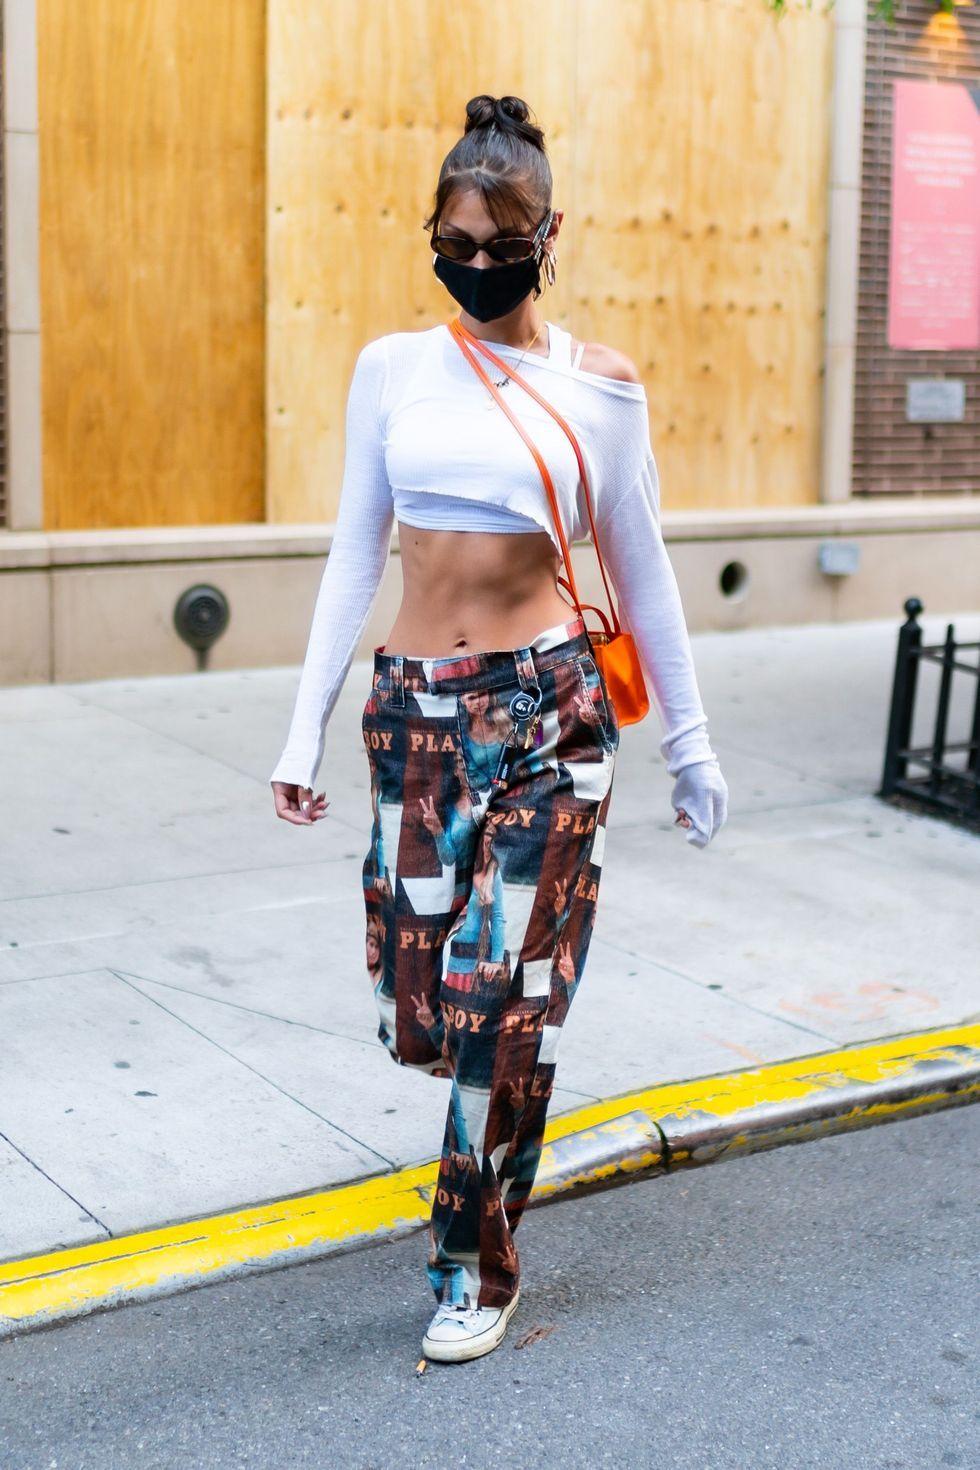 Gaya Pakaian Bella Hadid di Masa Pandemi, Tetap Seksi di Jalanan!